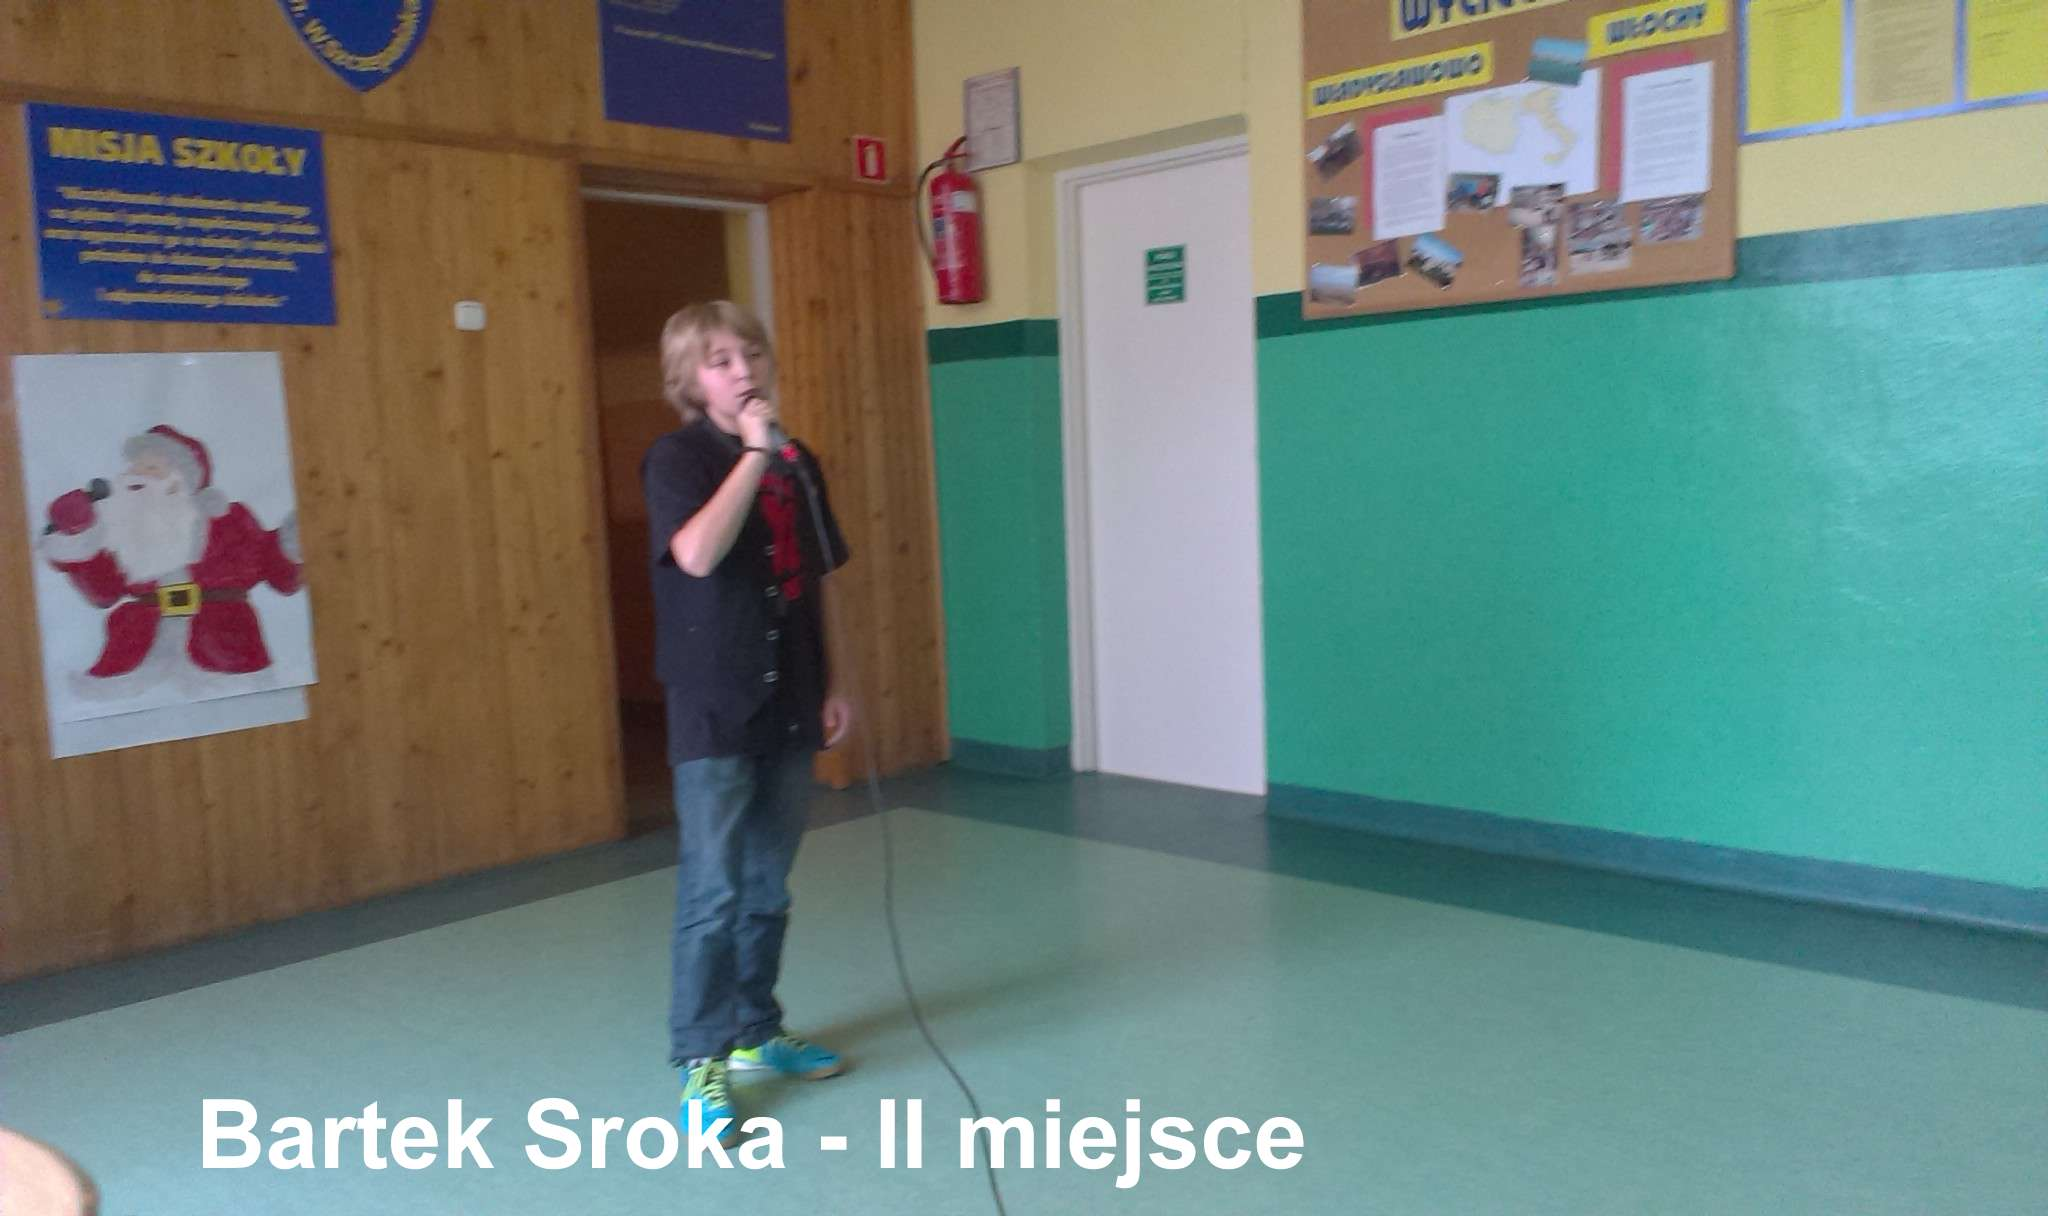 05 Bartek Sroka II miejsce